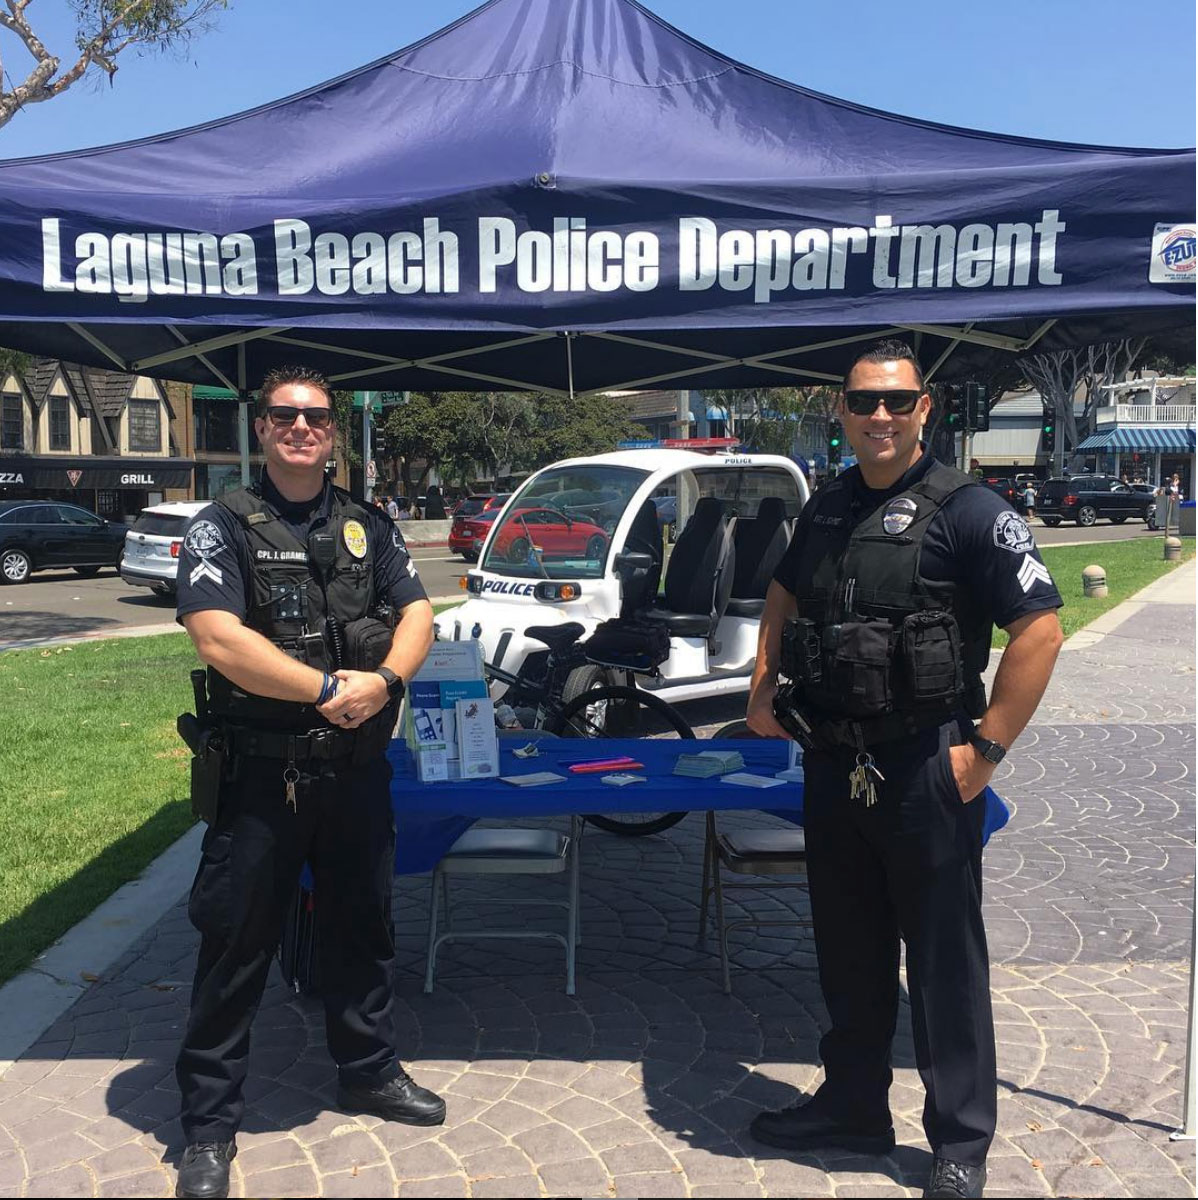 2b5bb204c625f City of Laguna Beach police